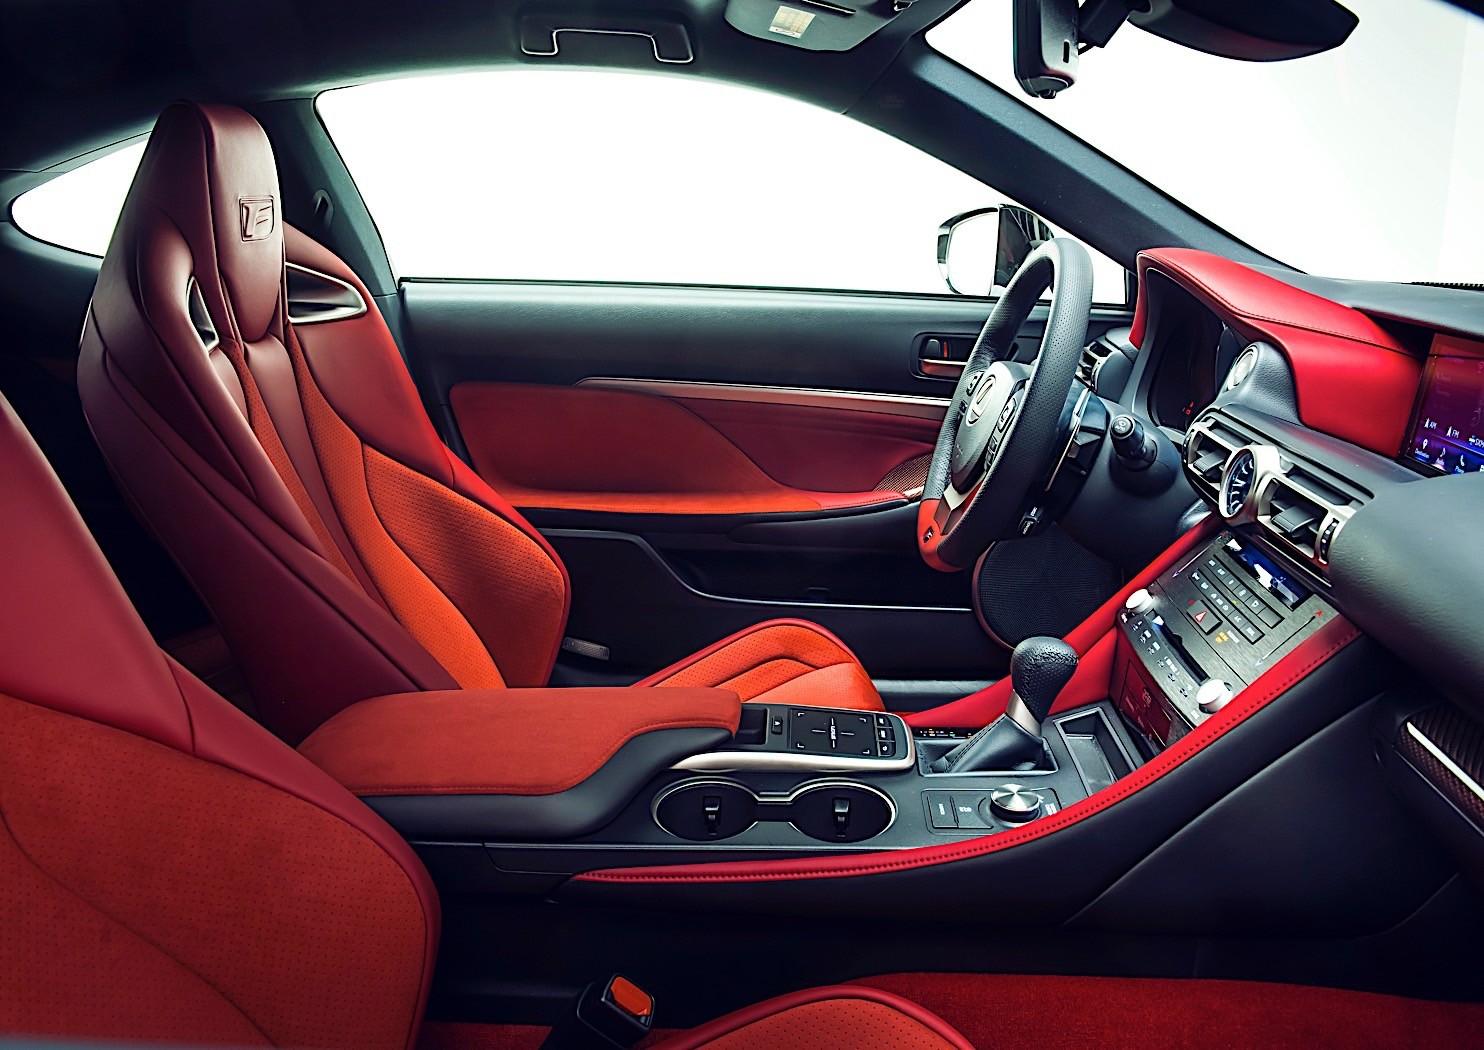 Toyota Jan Hot Photos >> 2020 Lexus RC F Readies for Detroit Auto Show Debut with Track Edition - autoevolution